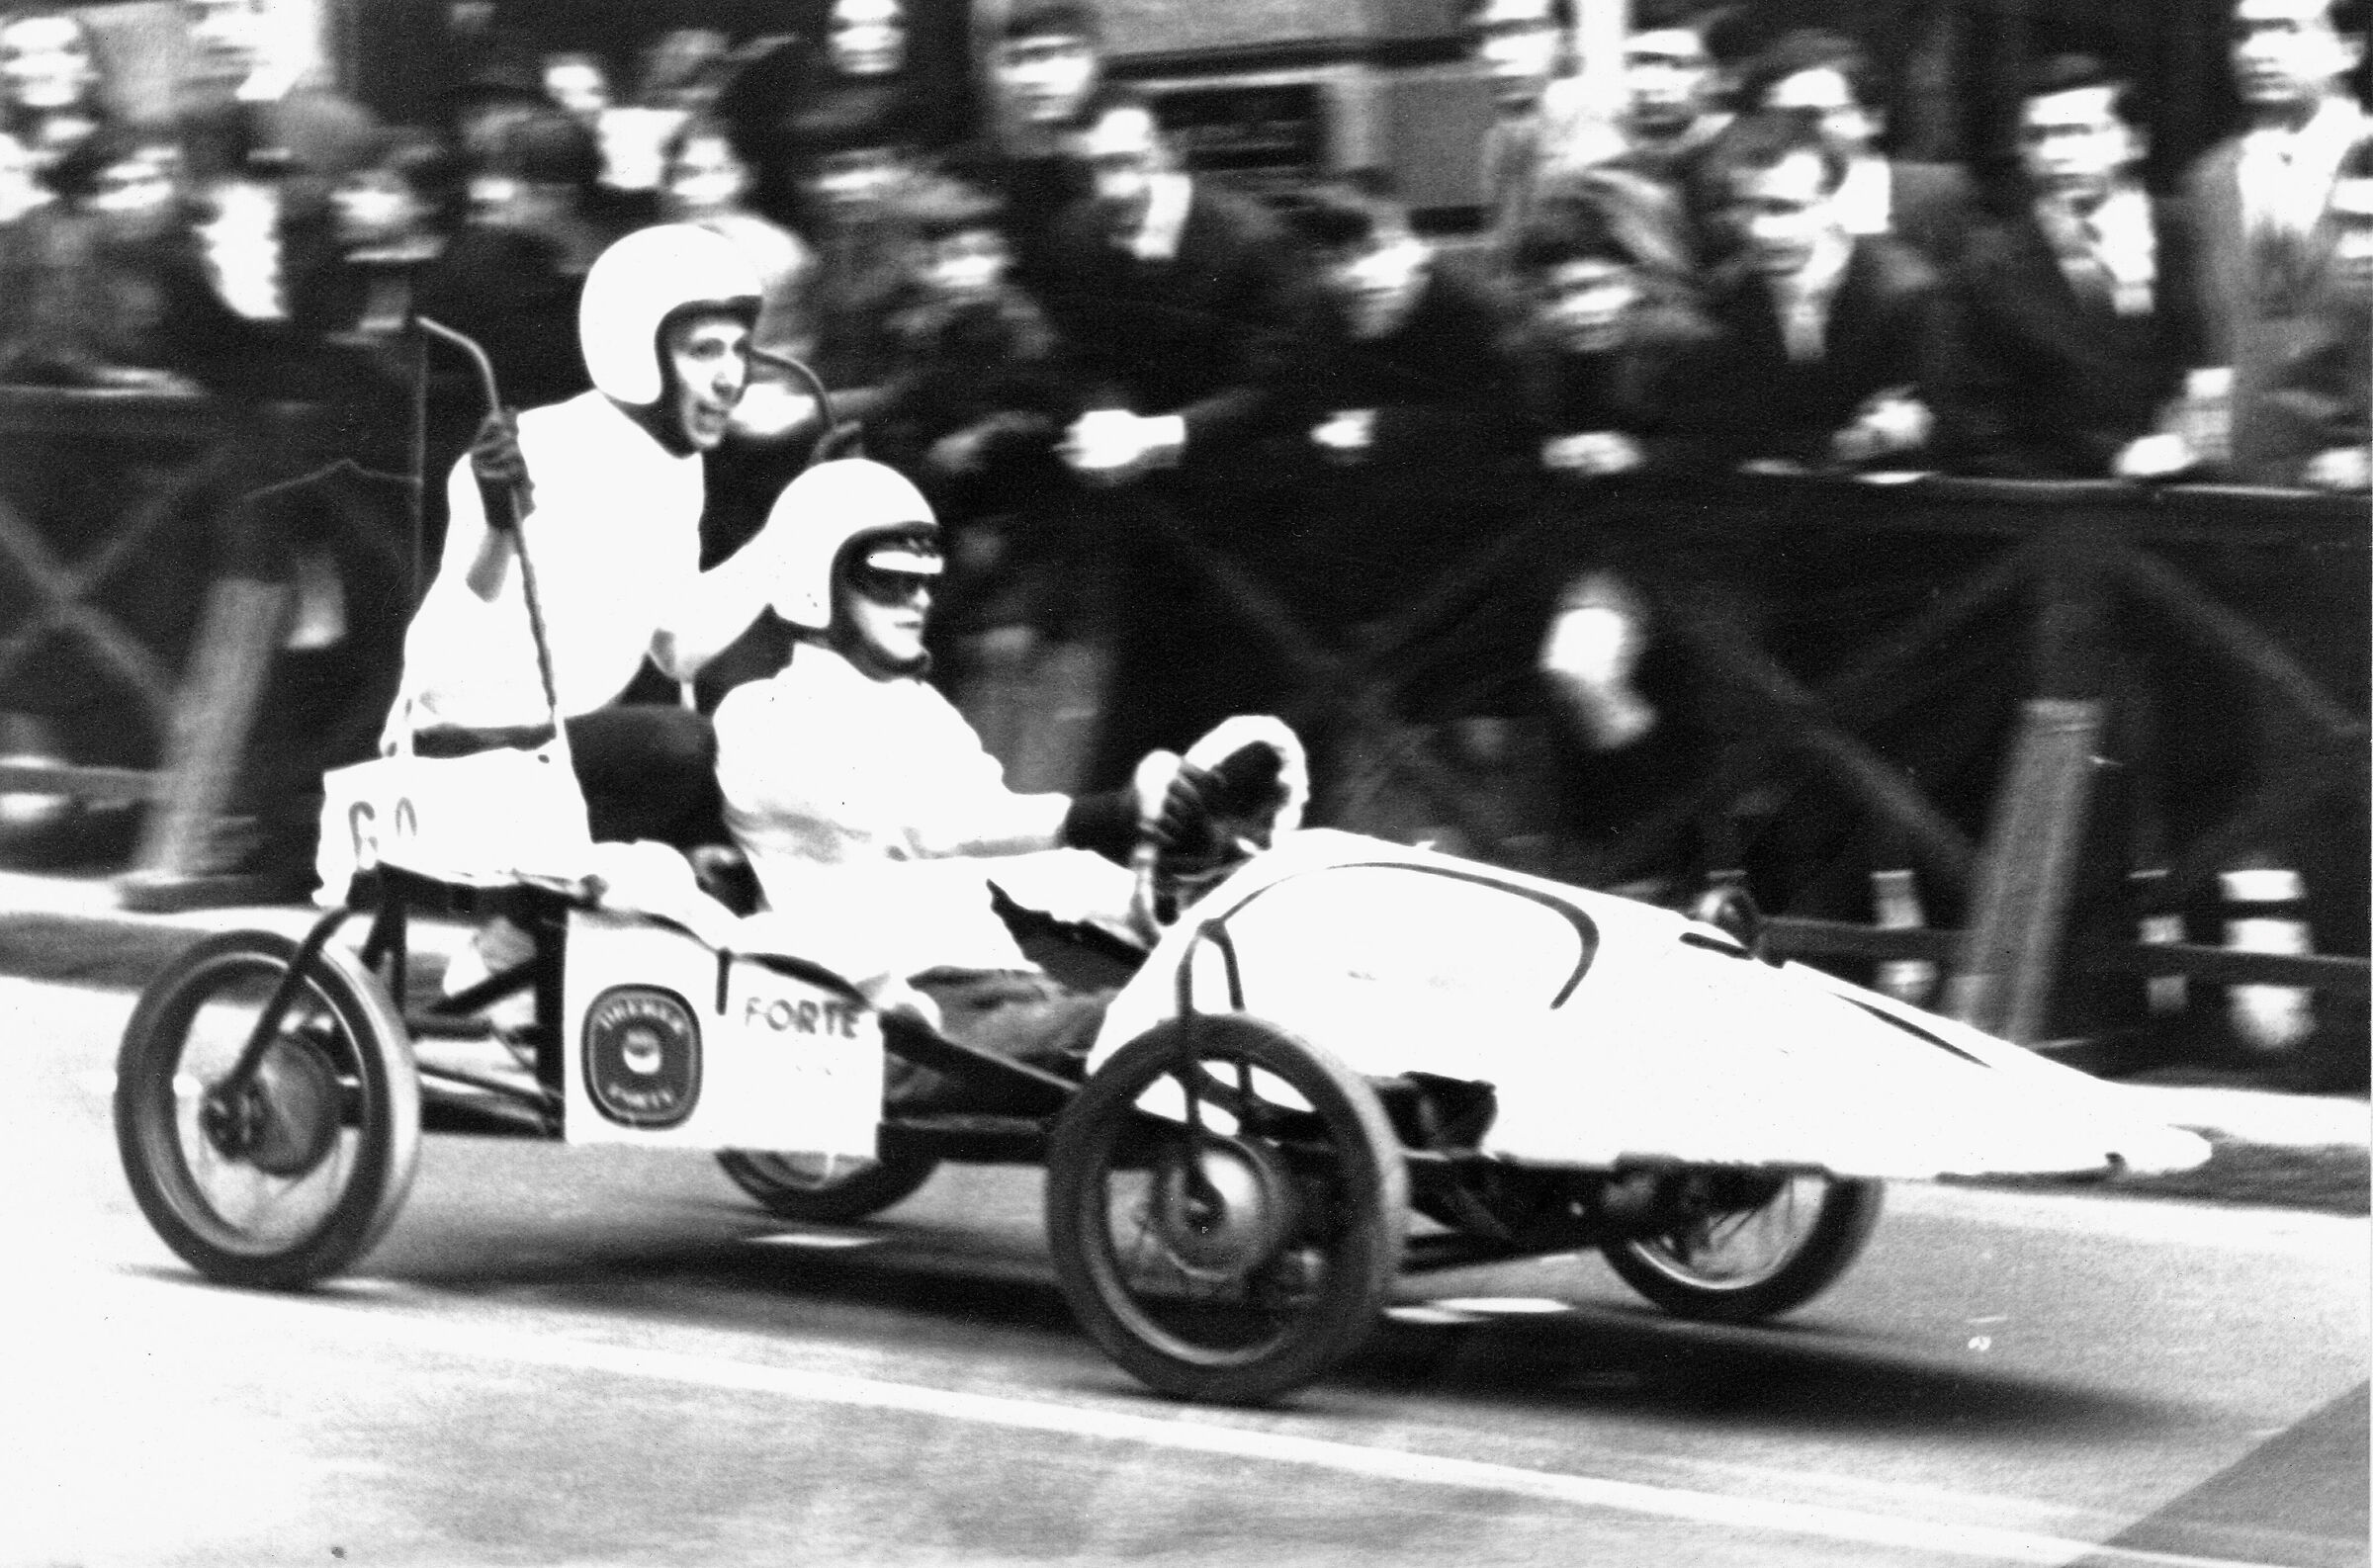 1969 Indianopolis season...